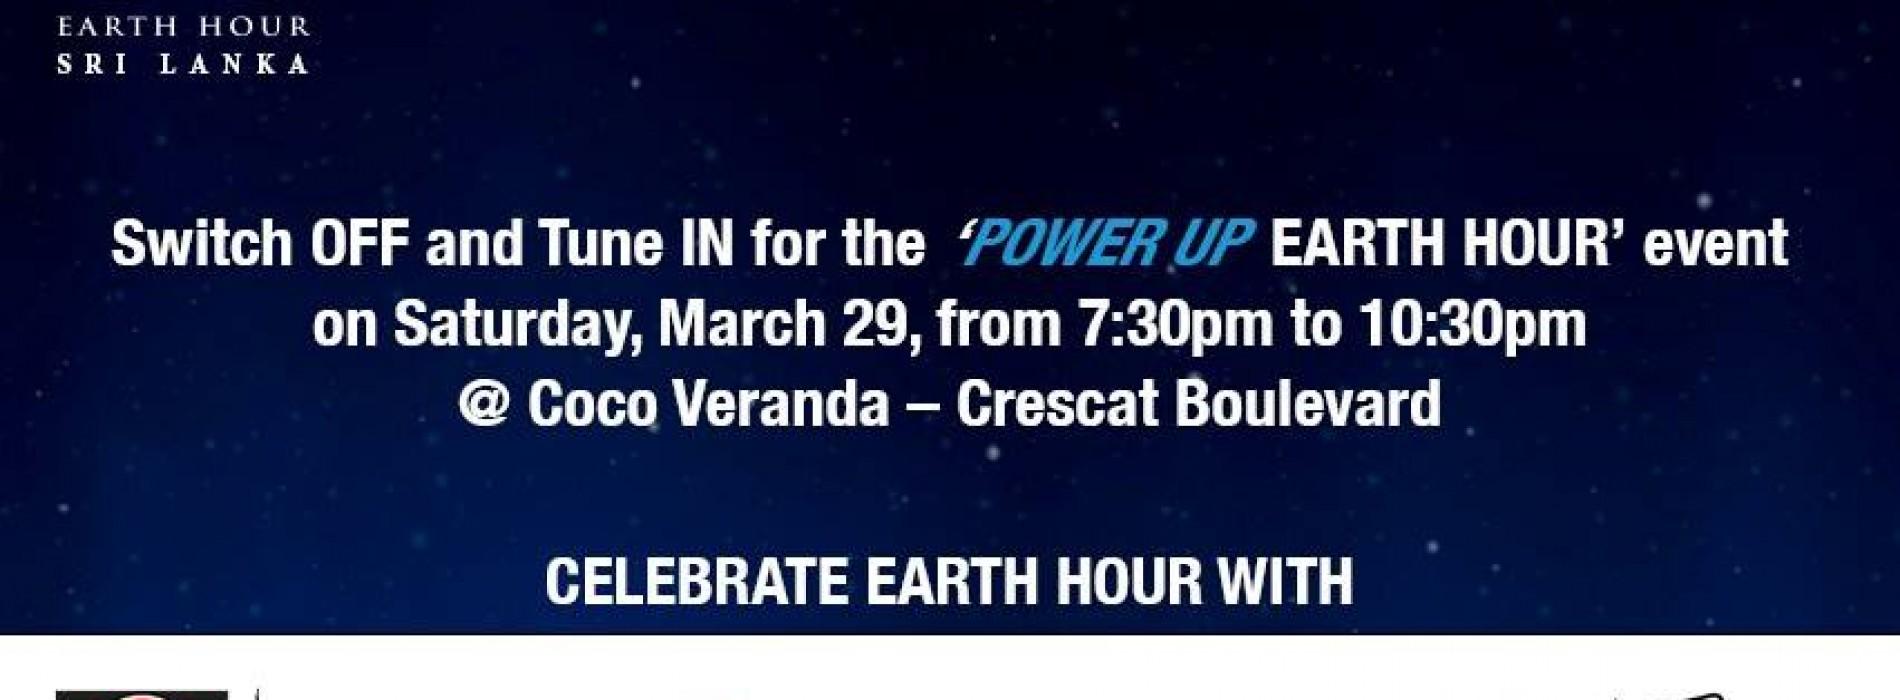 Earth Hour @ Coco Verandah